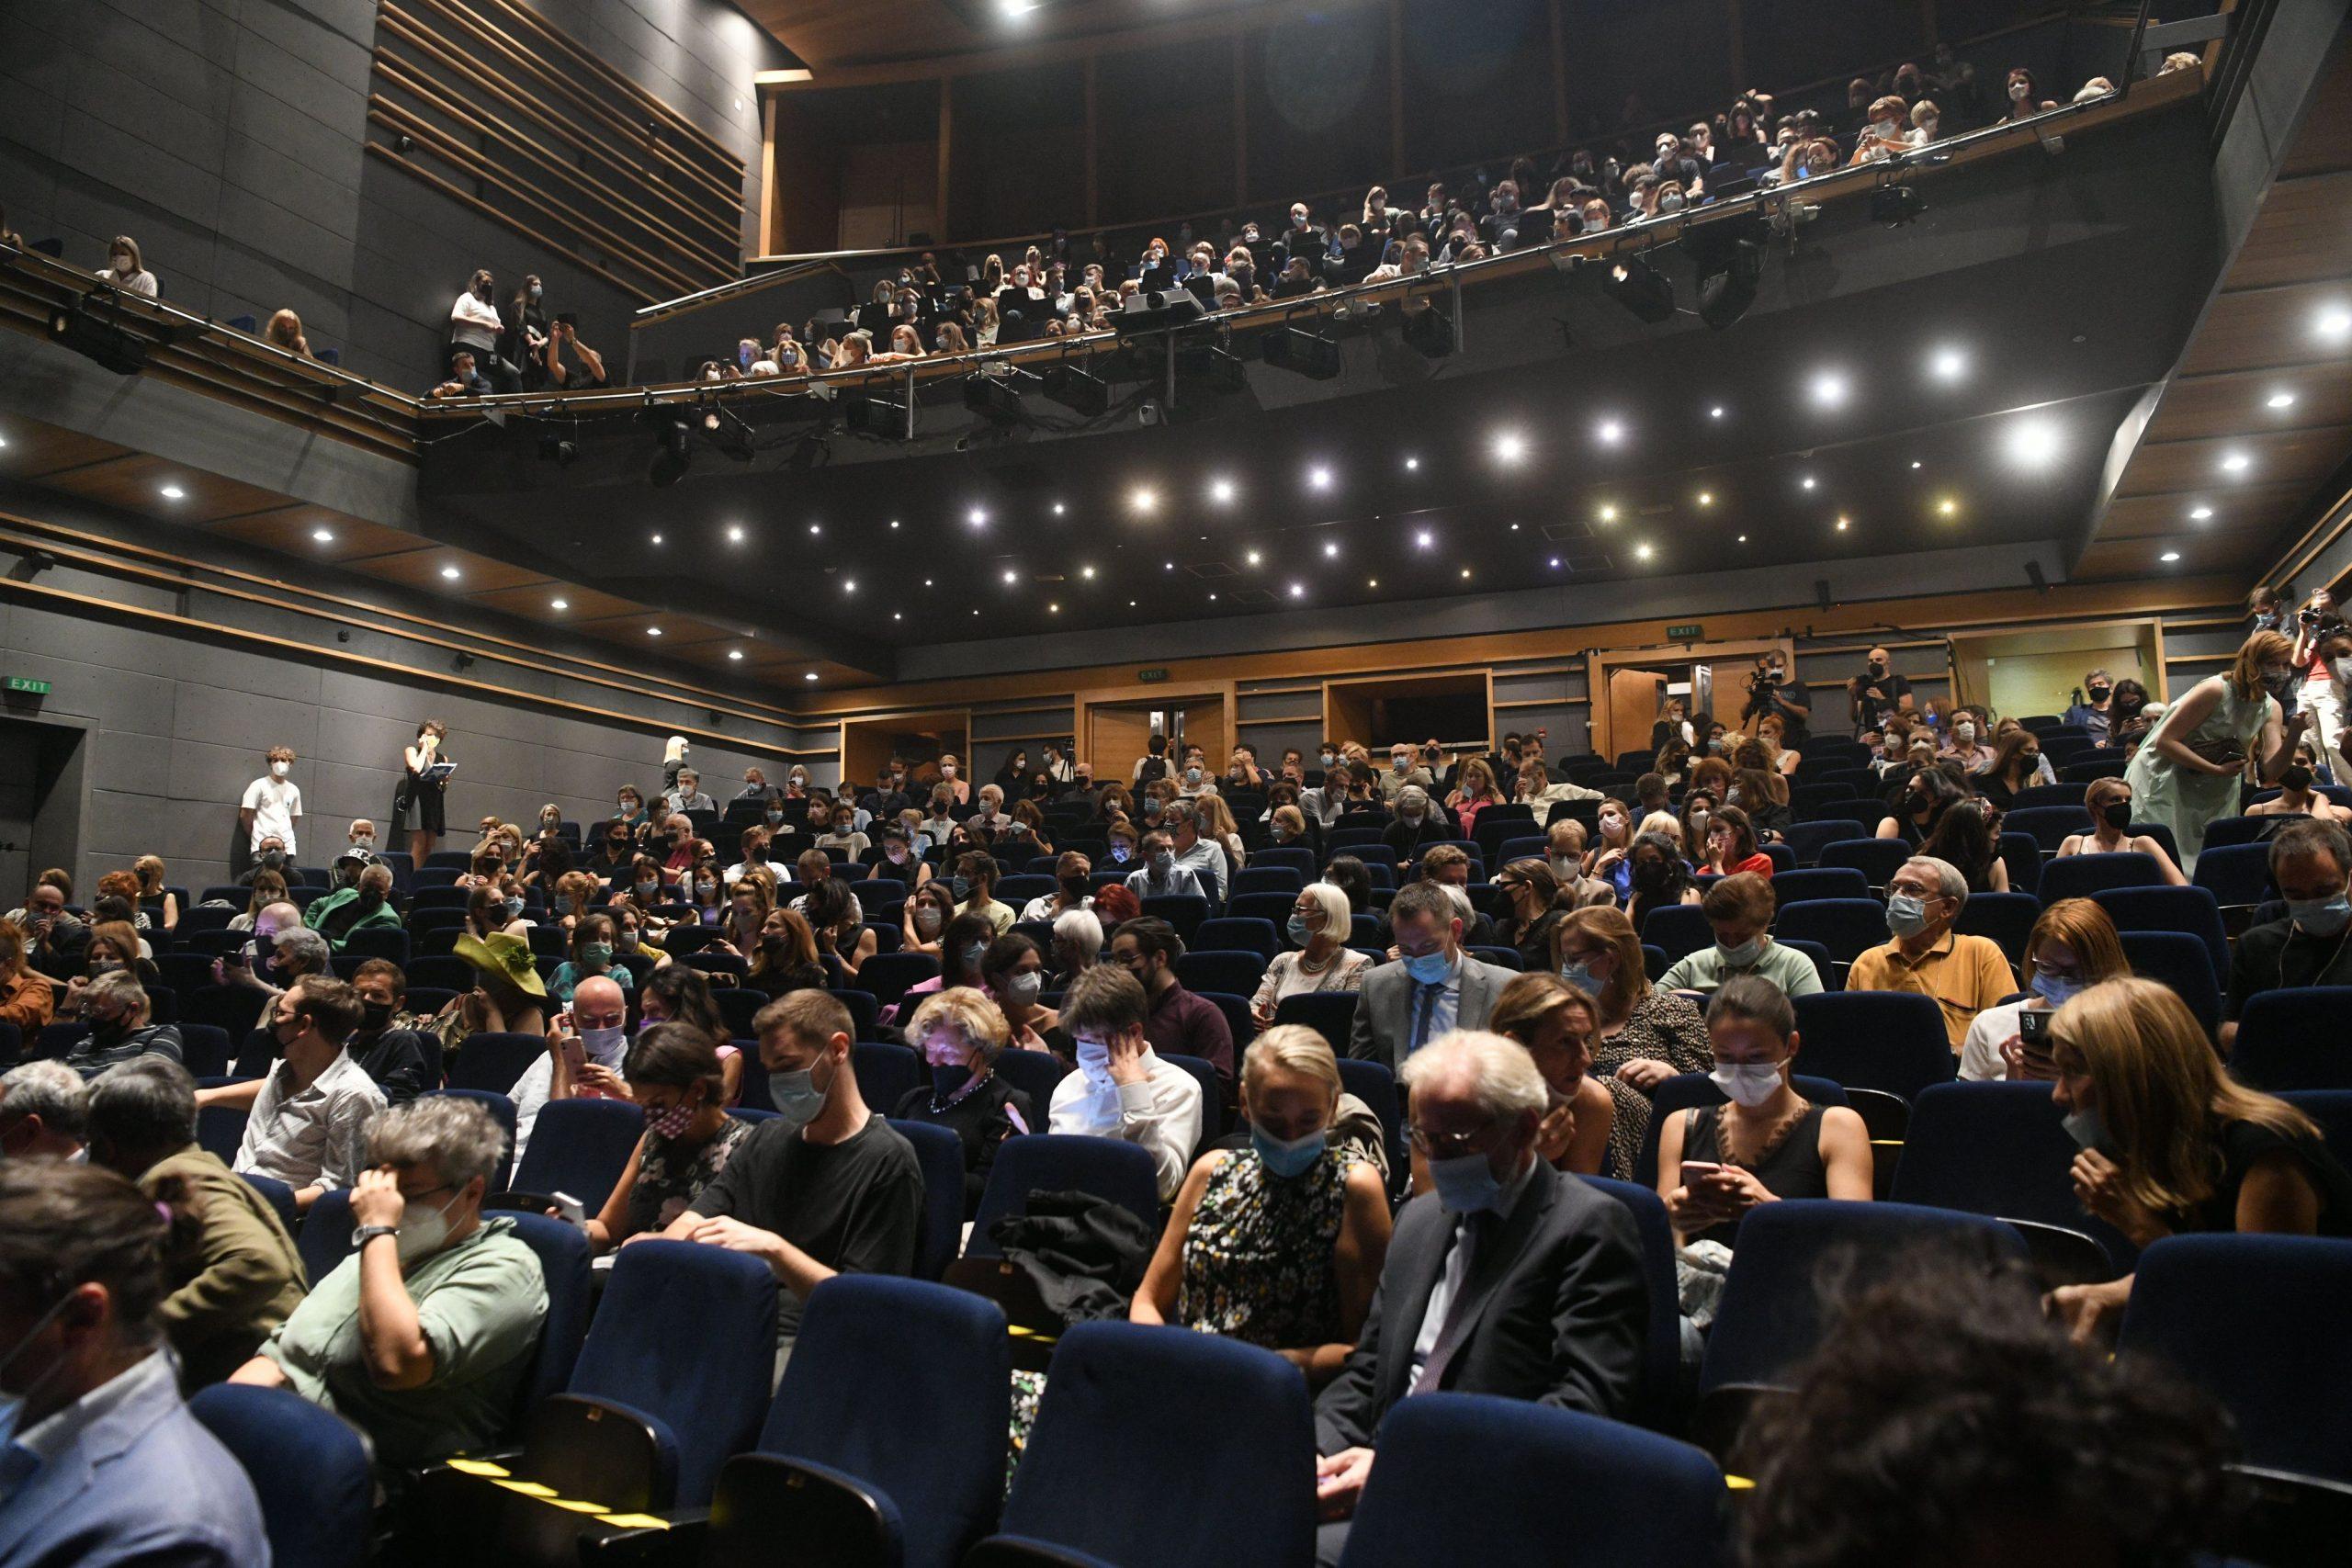 Otvaranje Bitefa u Jugoslovenskom dramskom pozorištu, JDP, Jugoslovensko dramsko pozorište